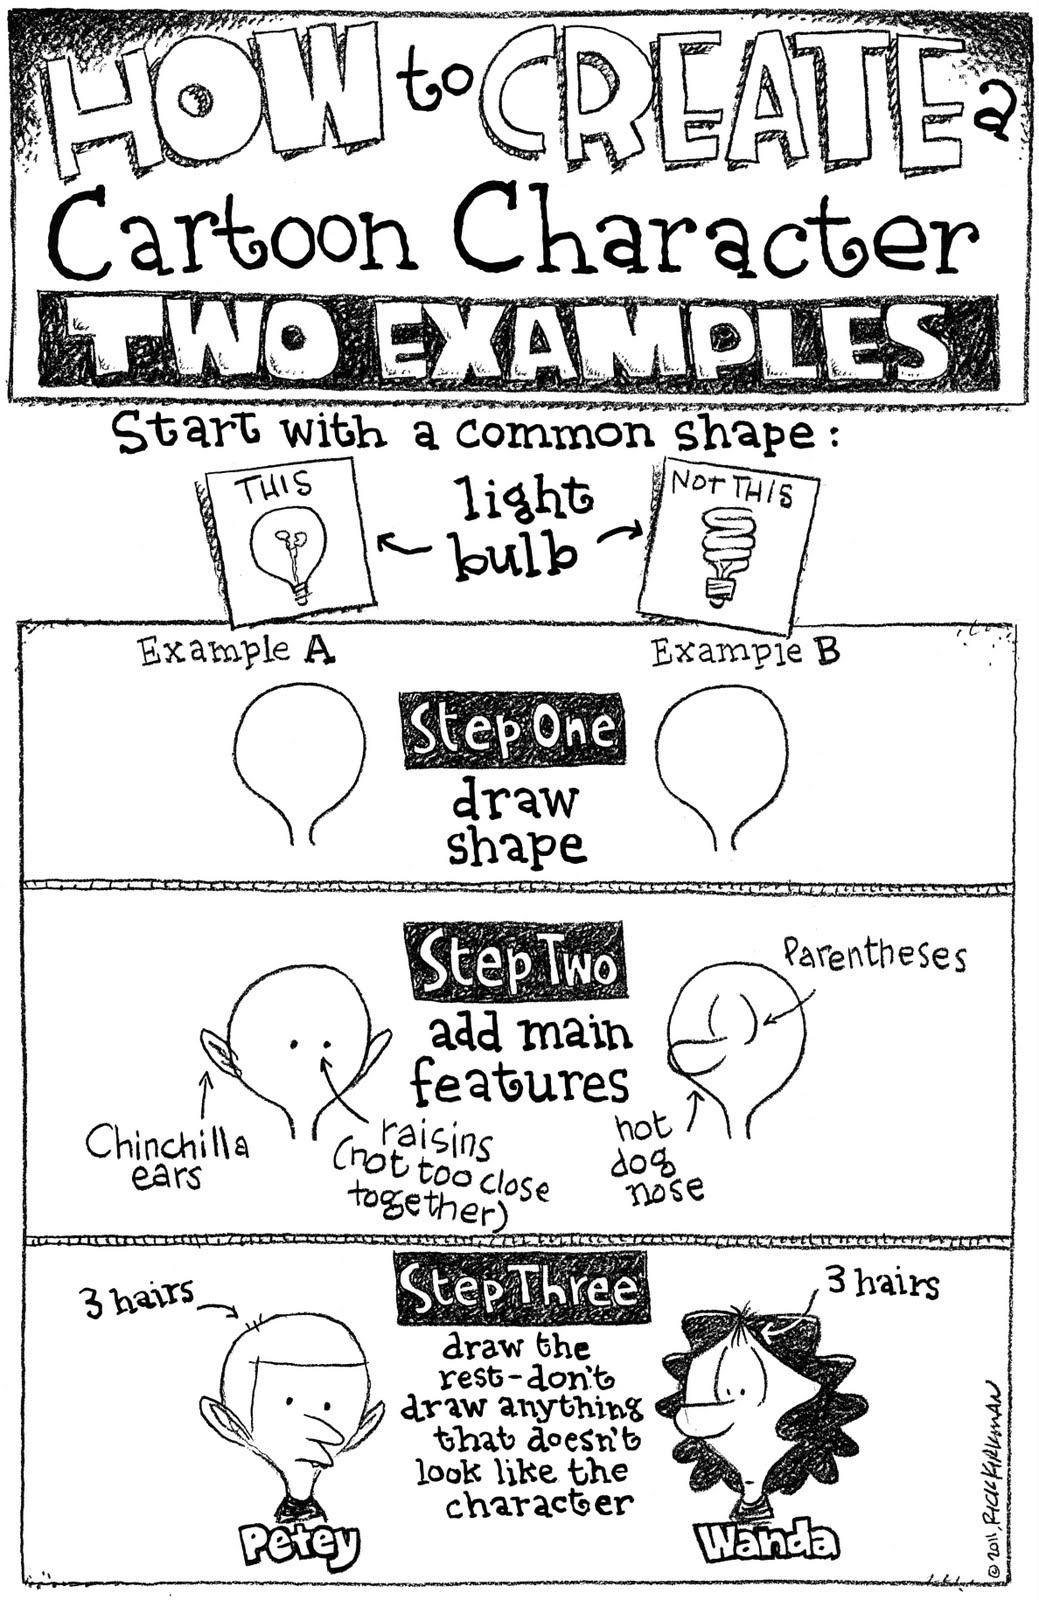 how to create a cartoon character